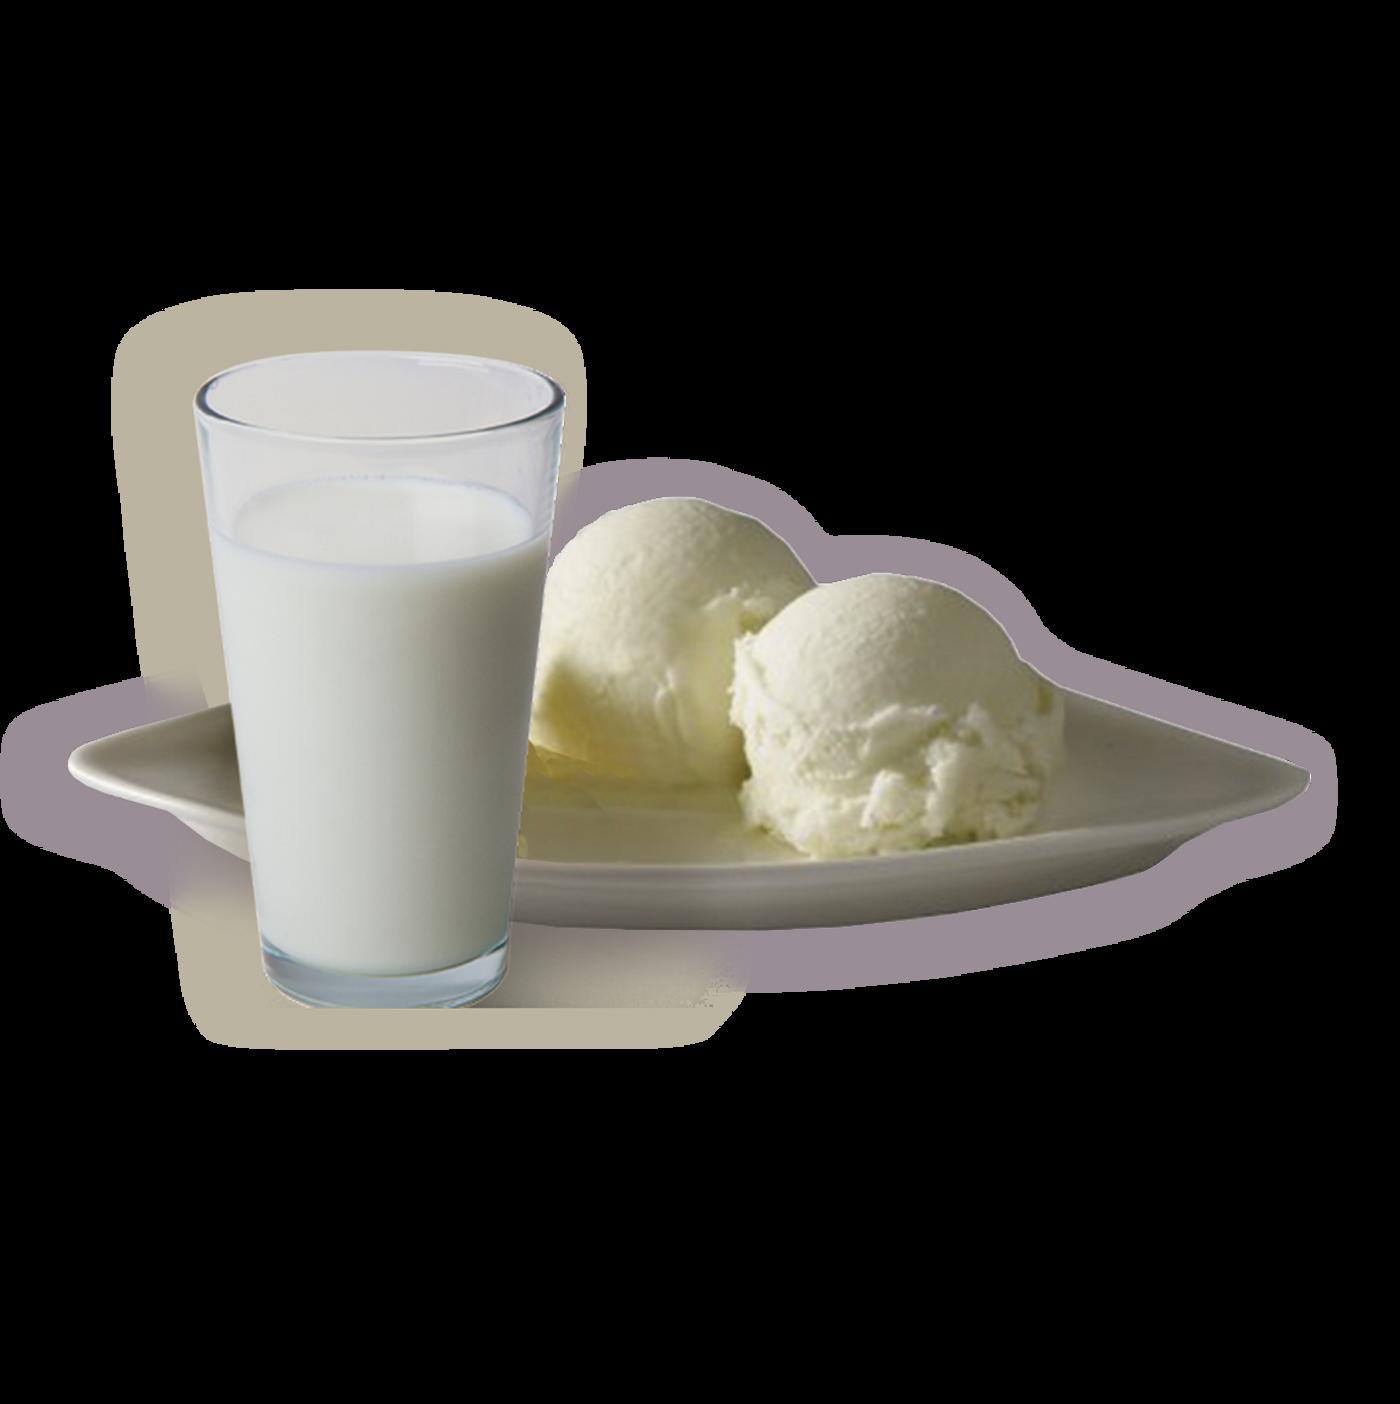 Helado de fior di latte